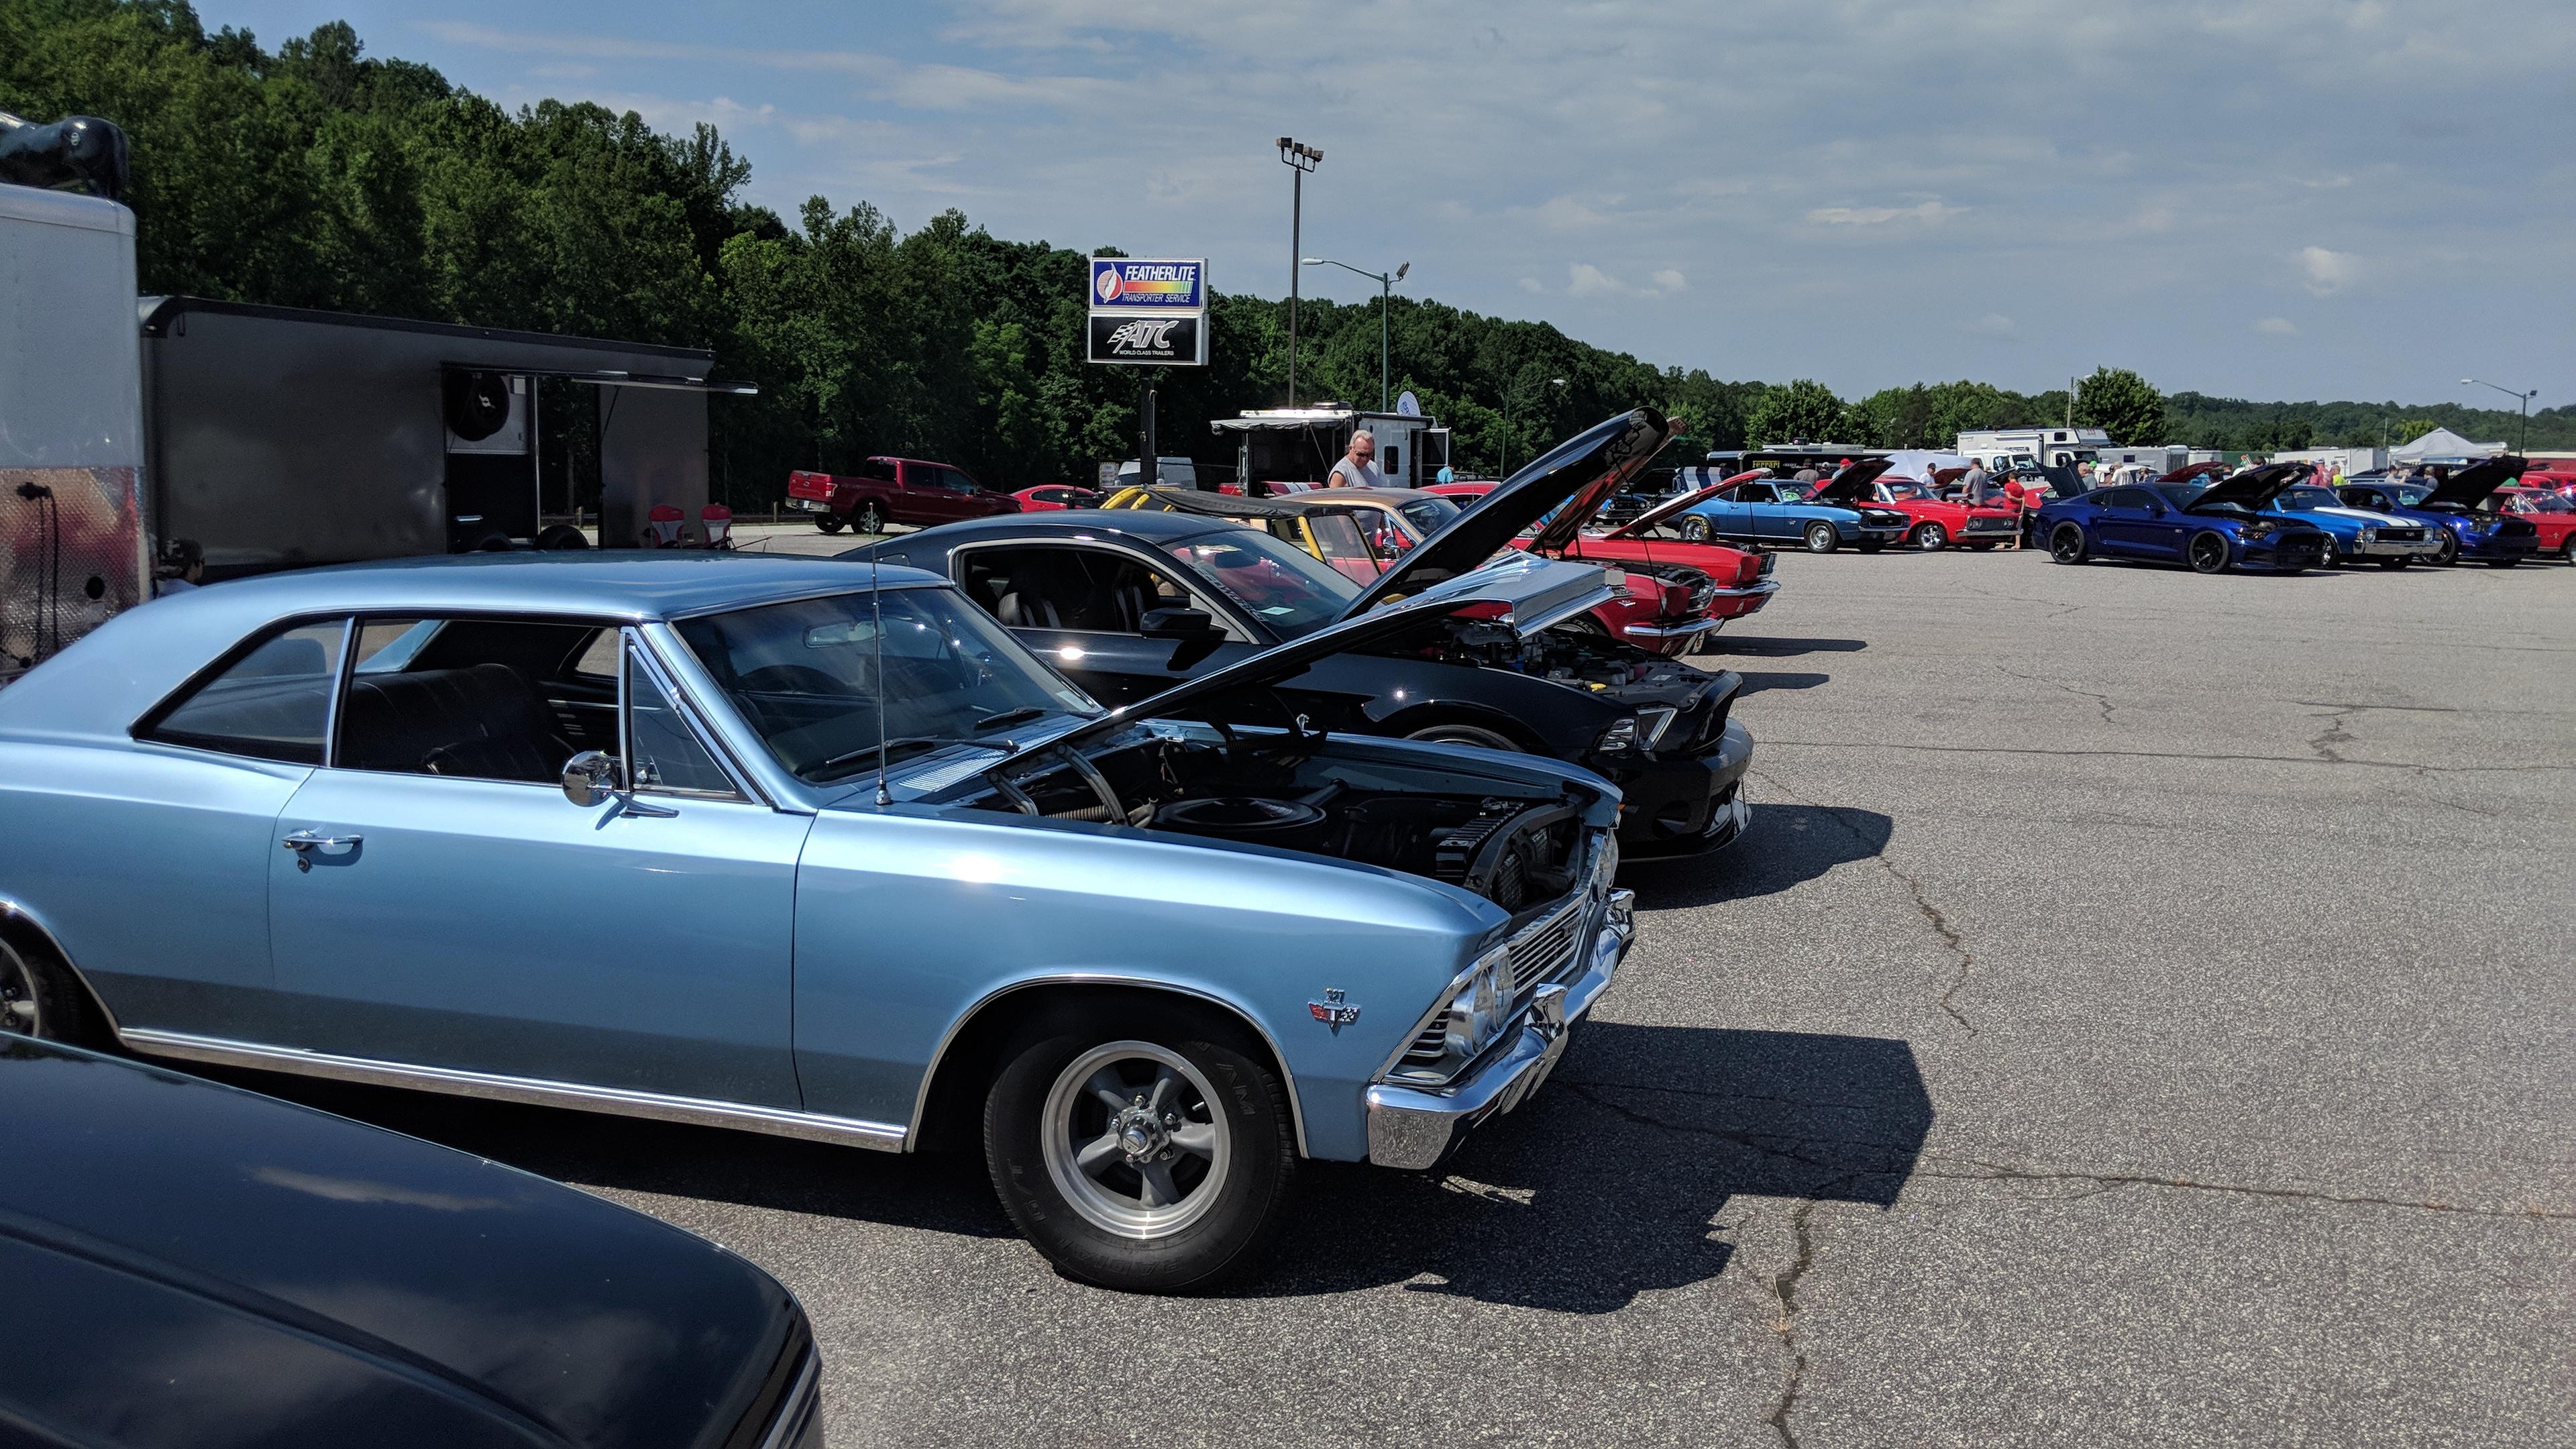 File:2018 DCHS Car Show - A Celebration of Classic Cars, Community ...